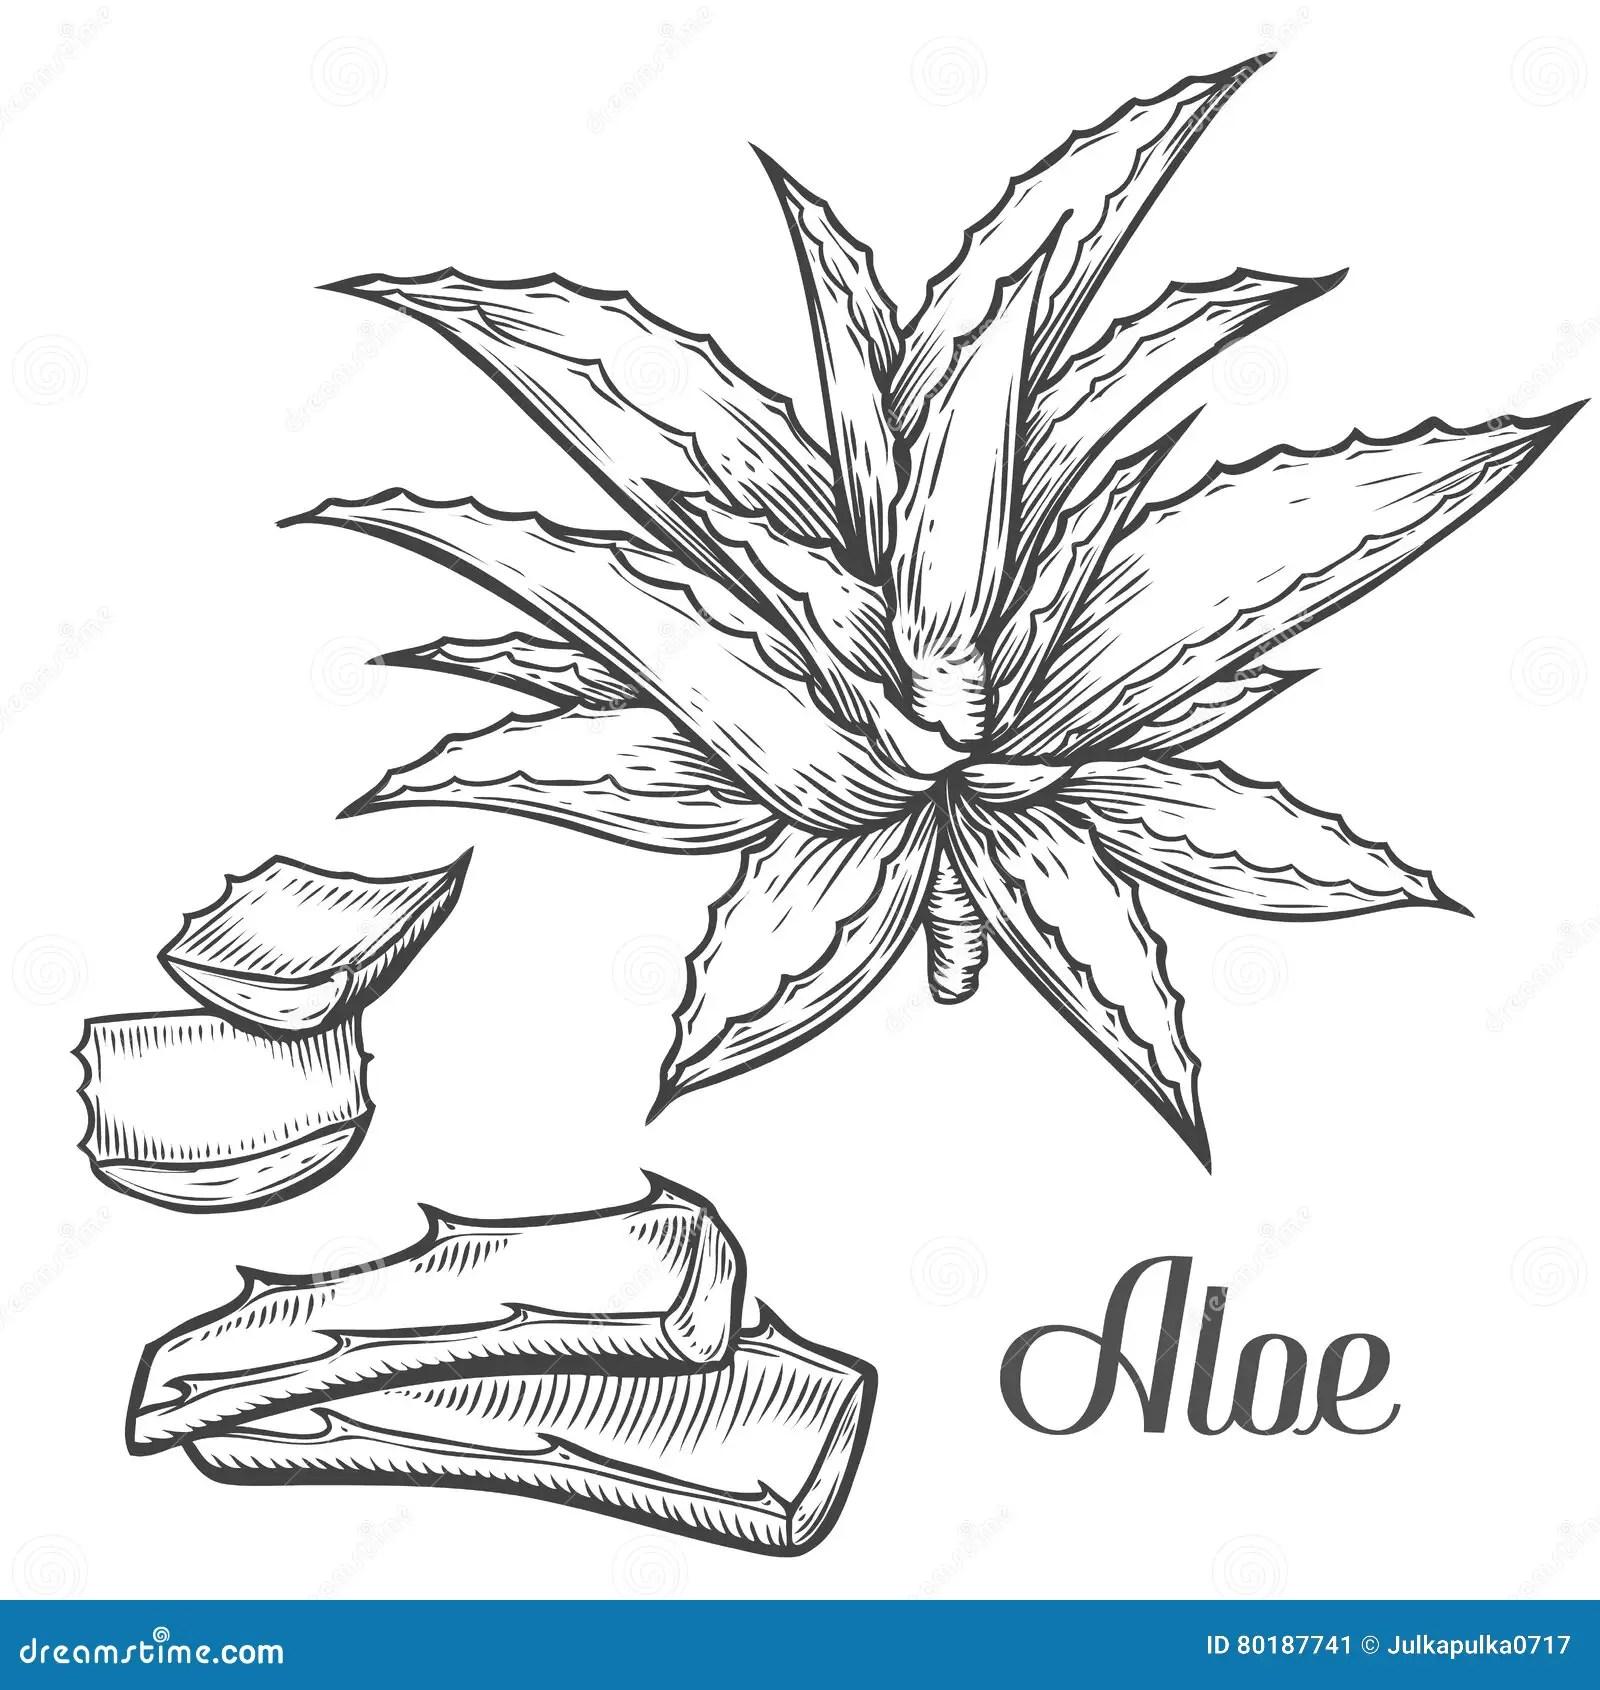 Aloe Vera Plant Hand Drawn Engraving Vector Illustration